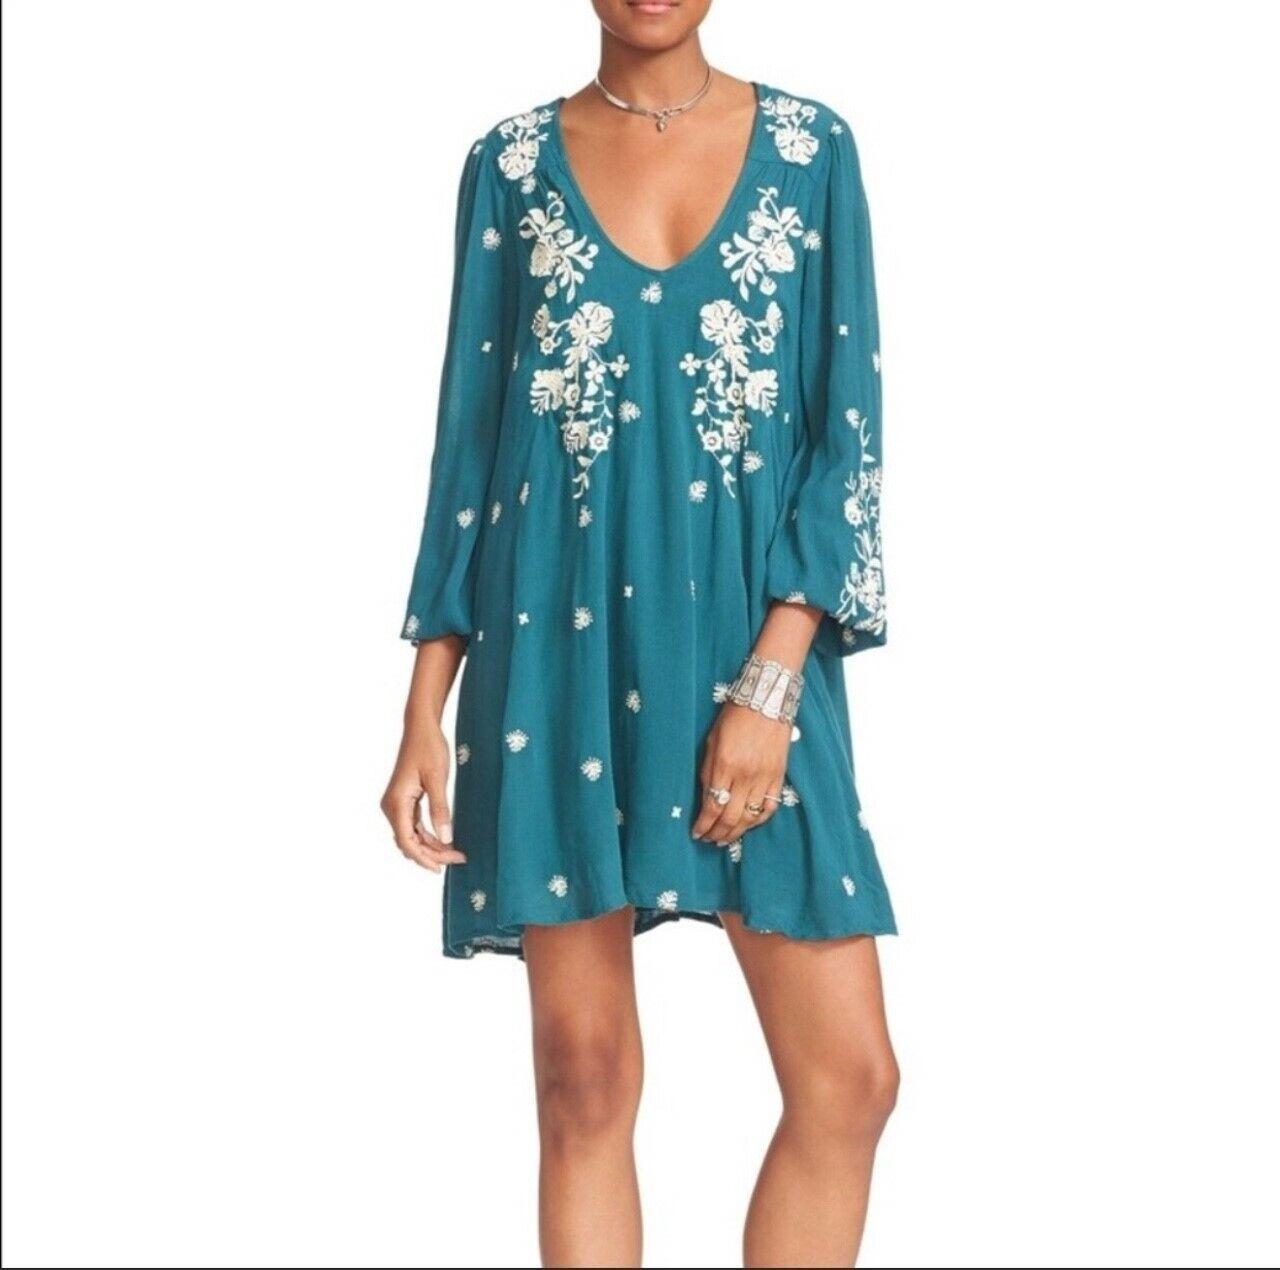 NWT Free People Blau Combo Sweet Tennessee Embroiderot Mini Dress Sz Large